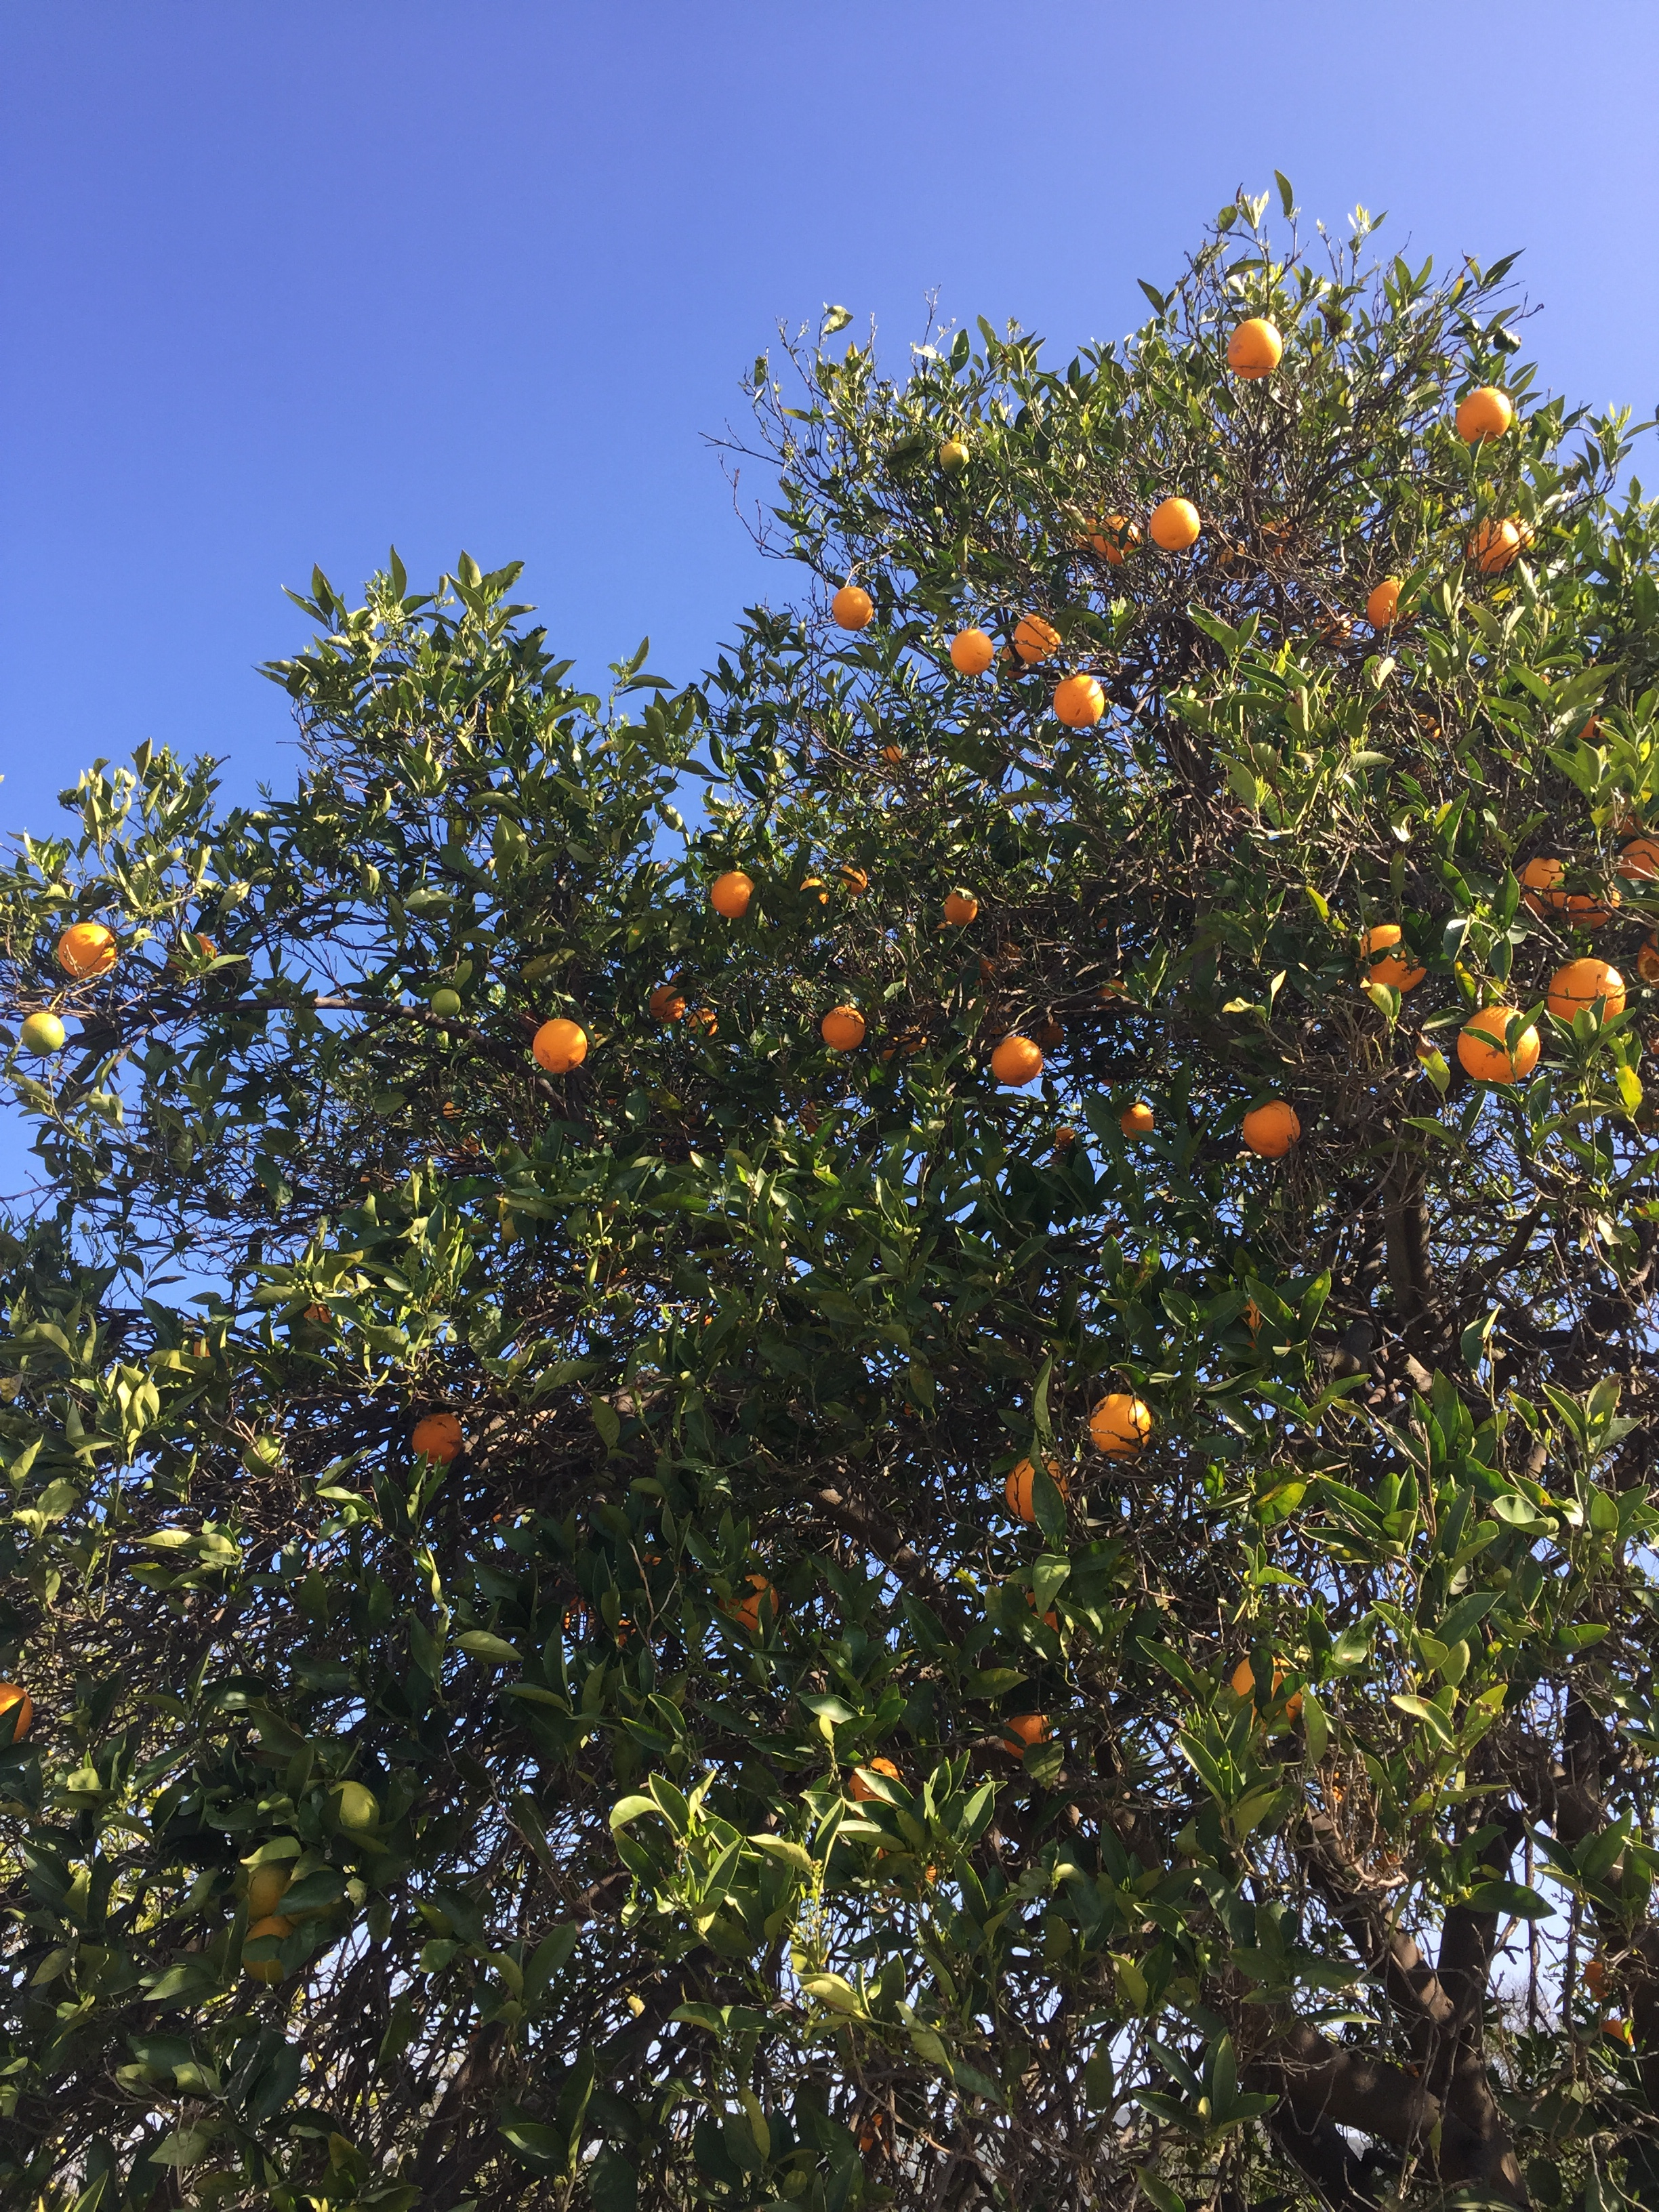 Oranges from an Orange Grove in San Juan Capistrano